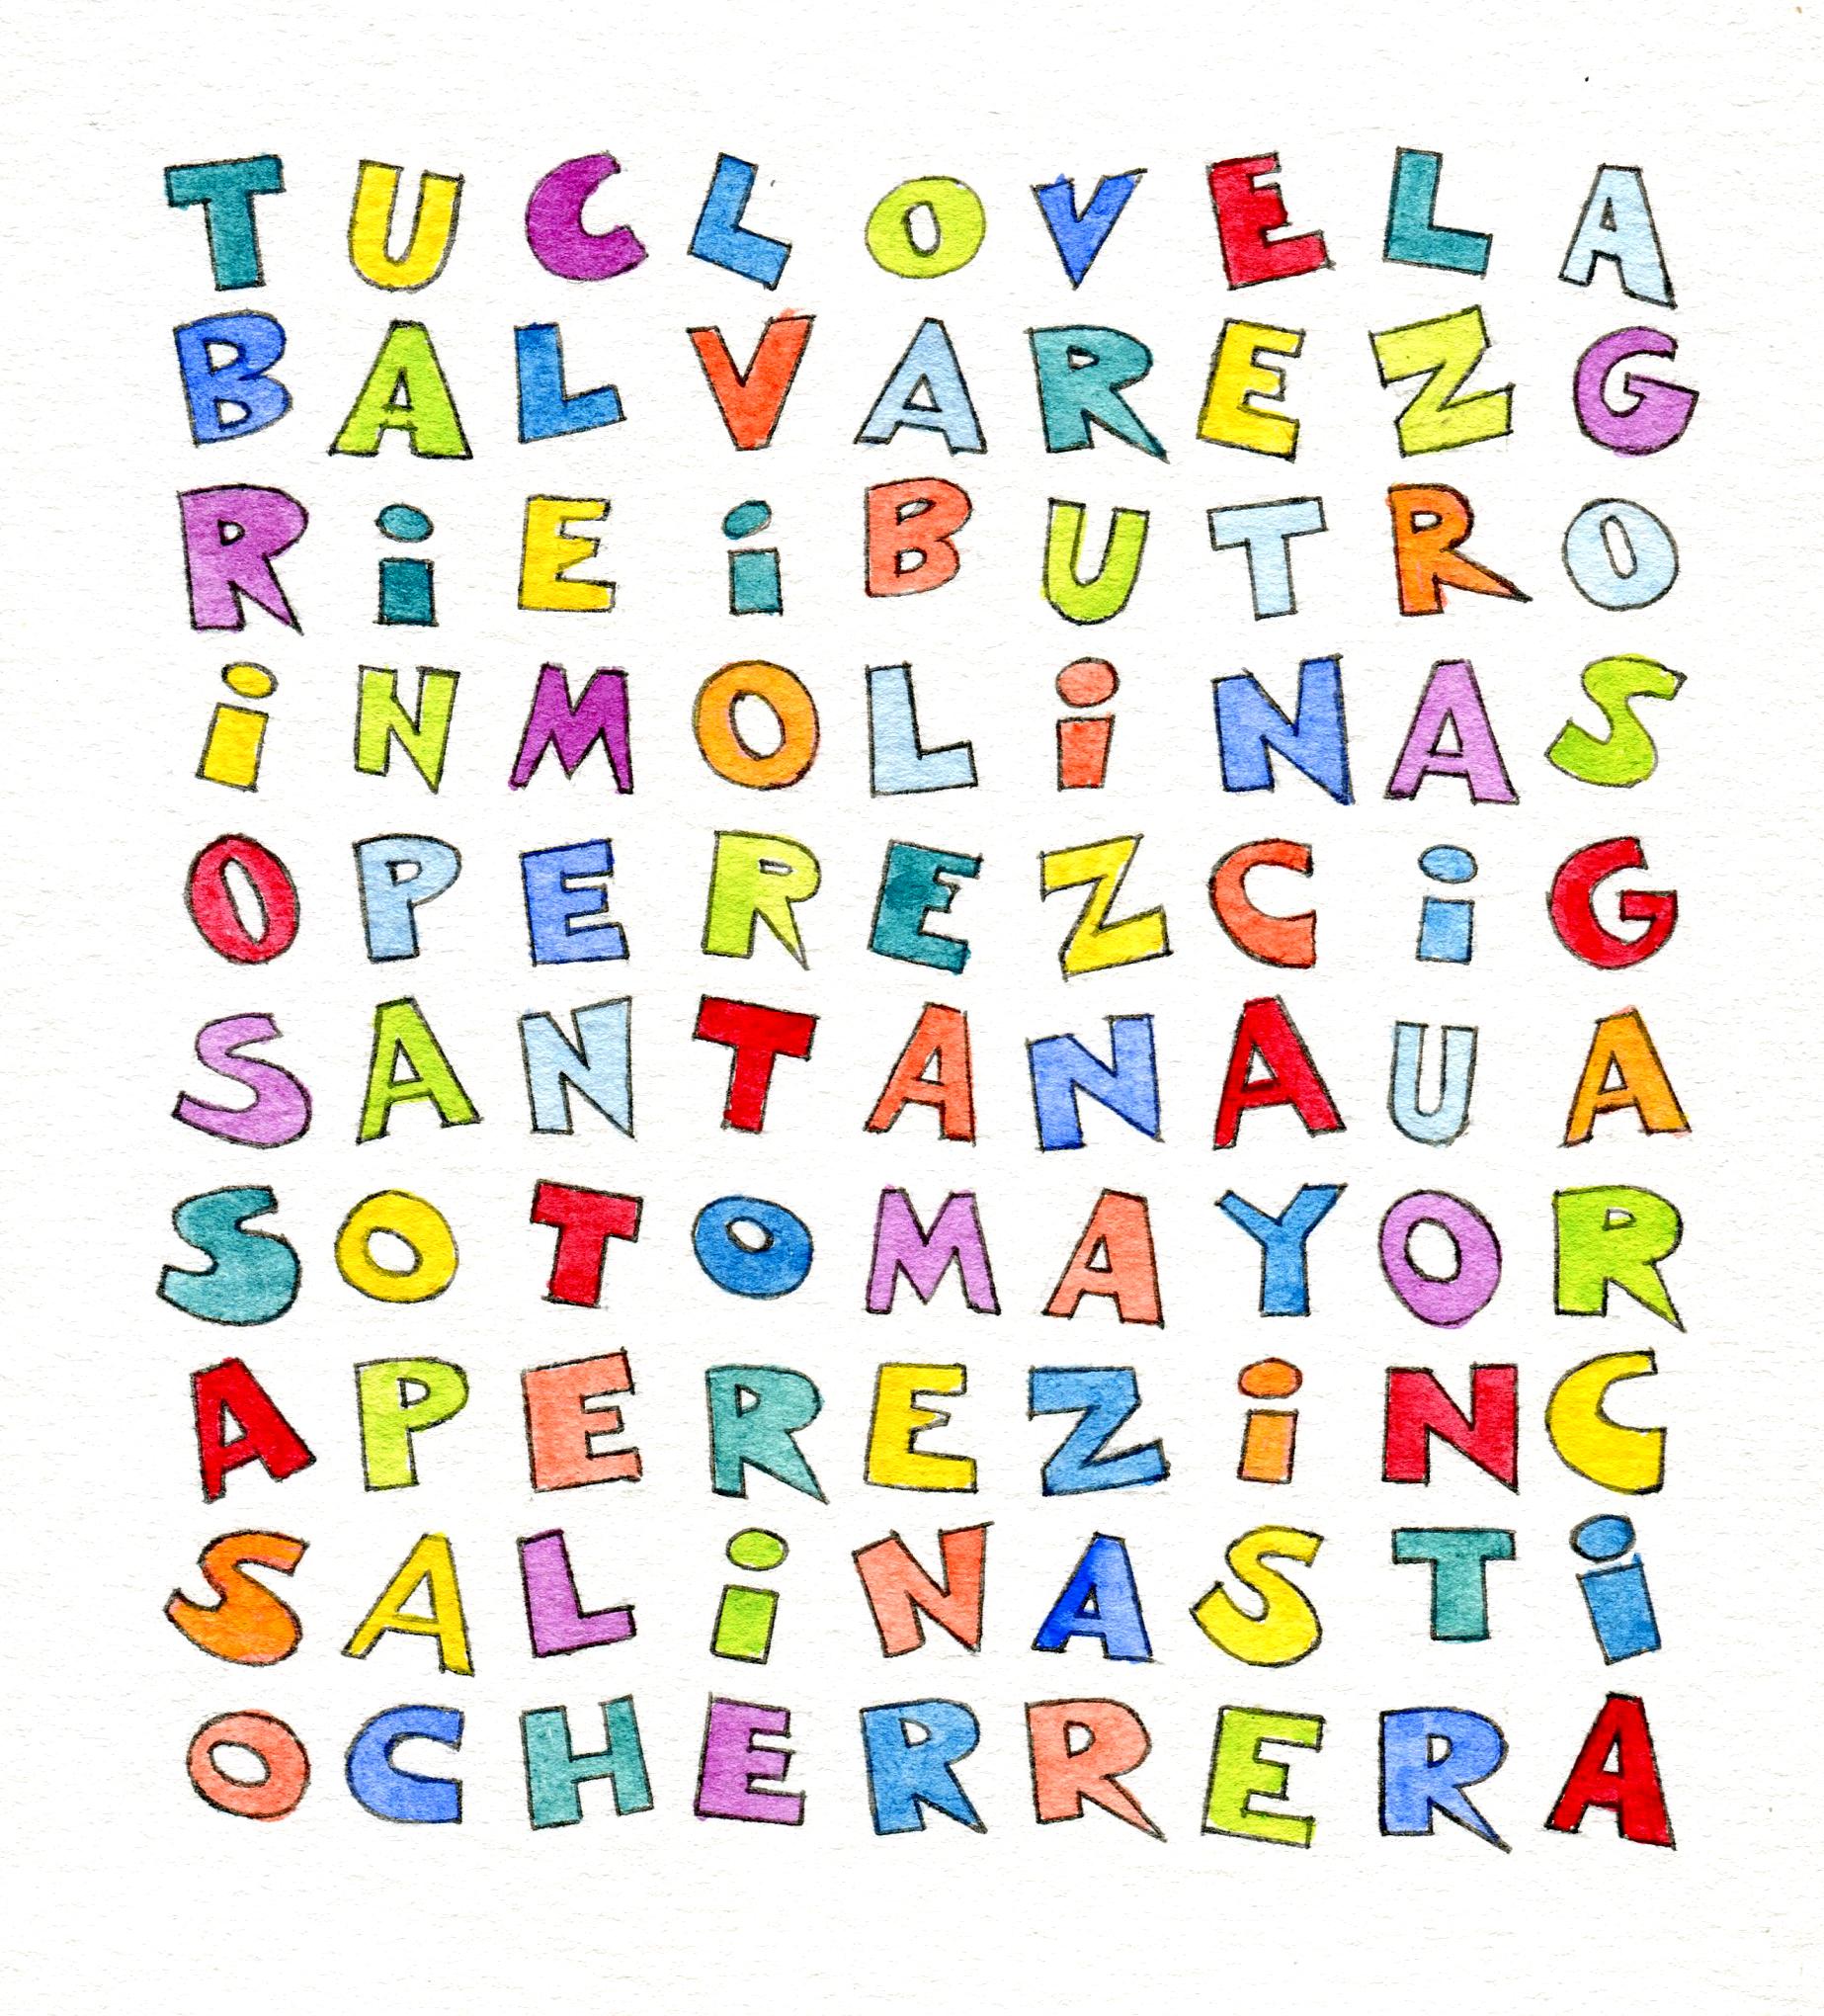 A ver si descubres a los hispanounidenses famosos en esta sopa de letras. Ilustración de María Cristina Brusca